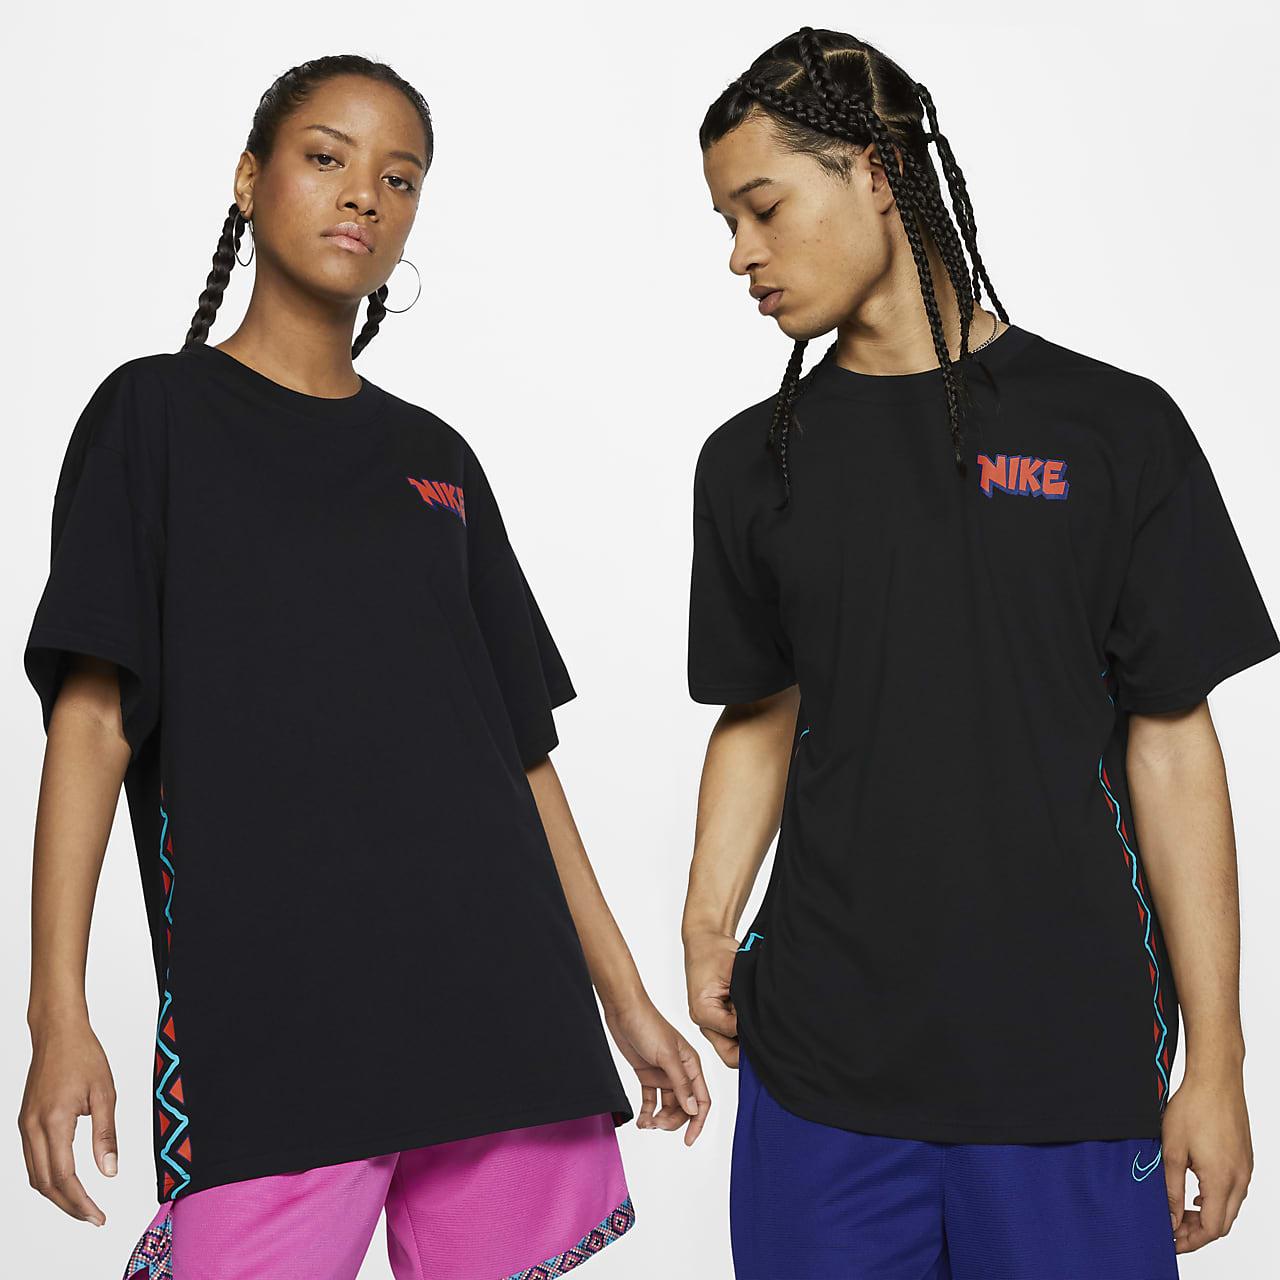 Nike Exploration Series Basketball T-Shirt